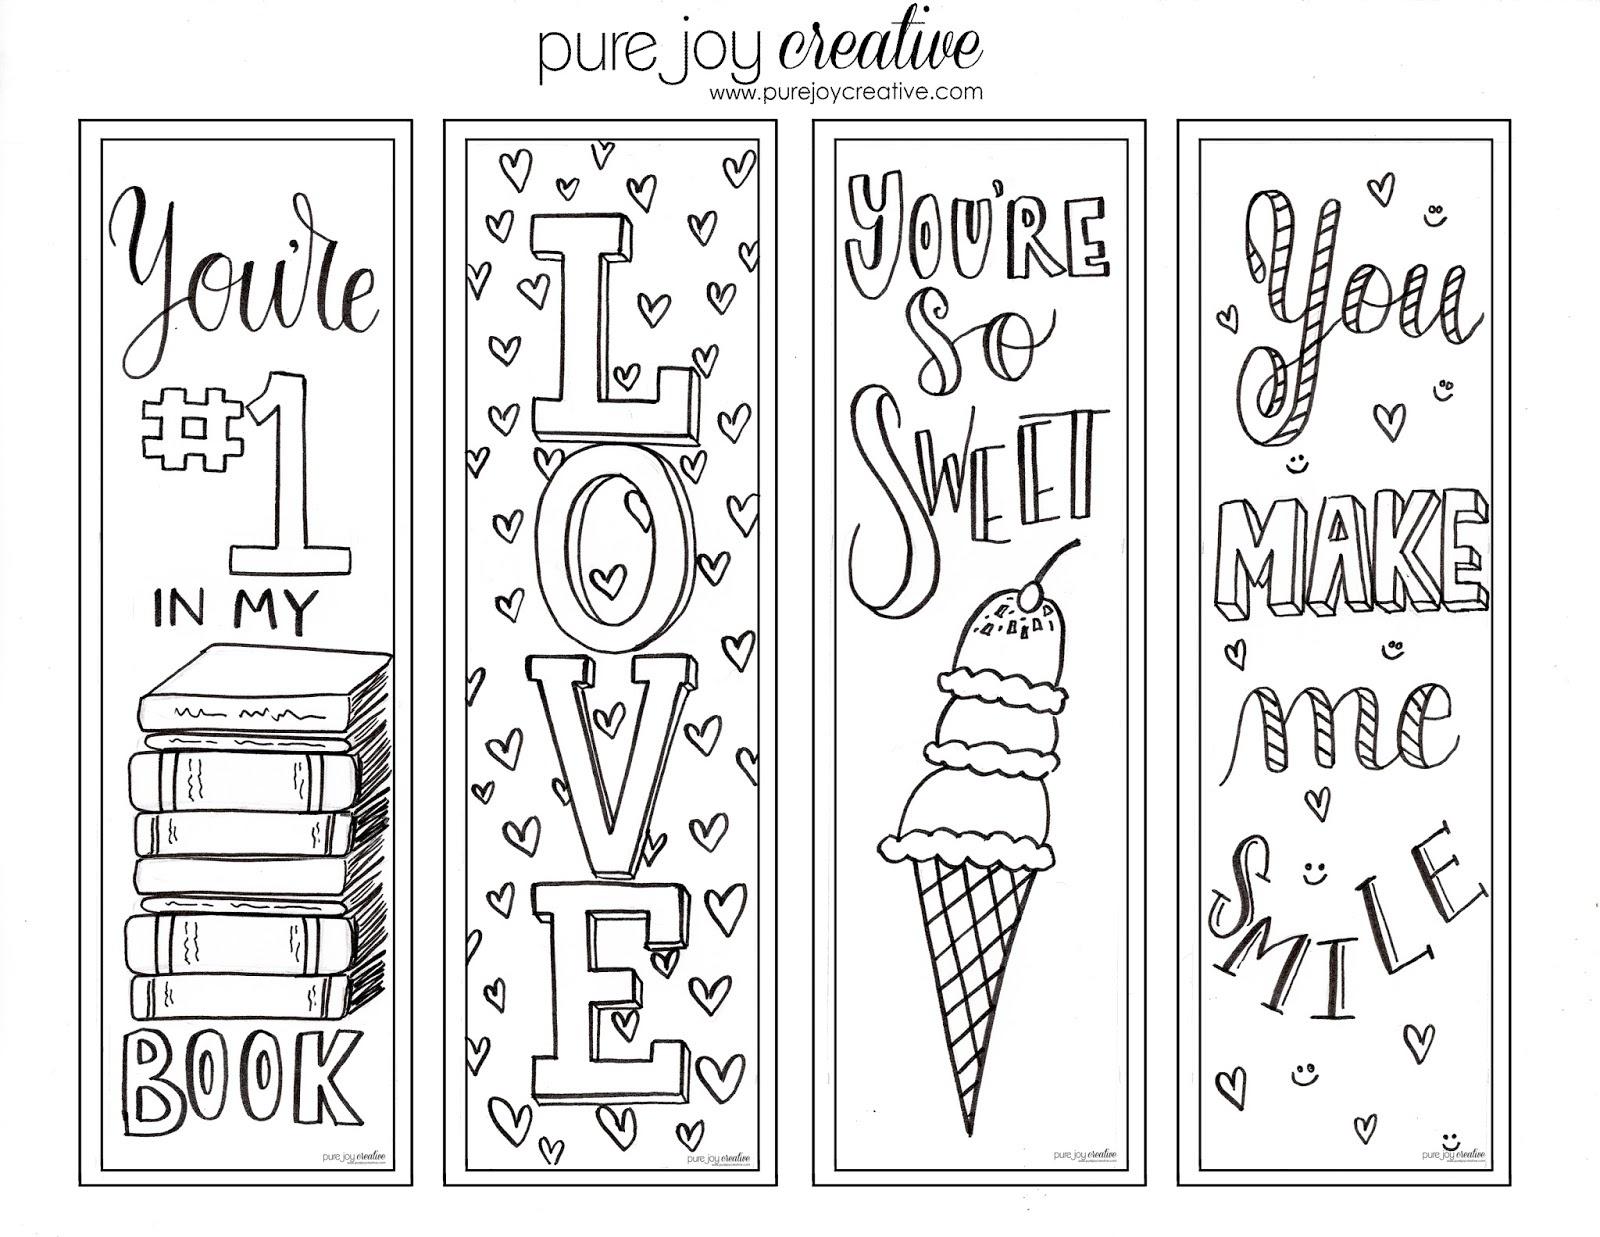 Pure Joy Creative: Free Printable Valentines Day Cards And Bookmarks - Free Printable Valentine Bookmarks